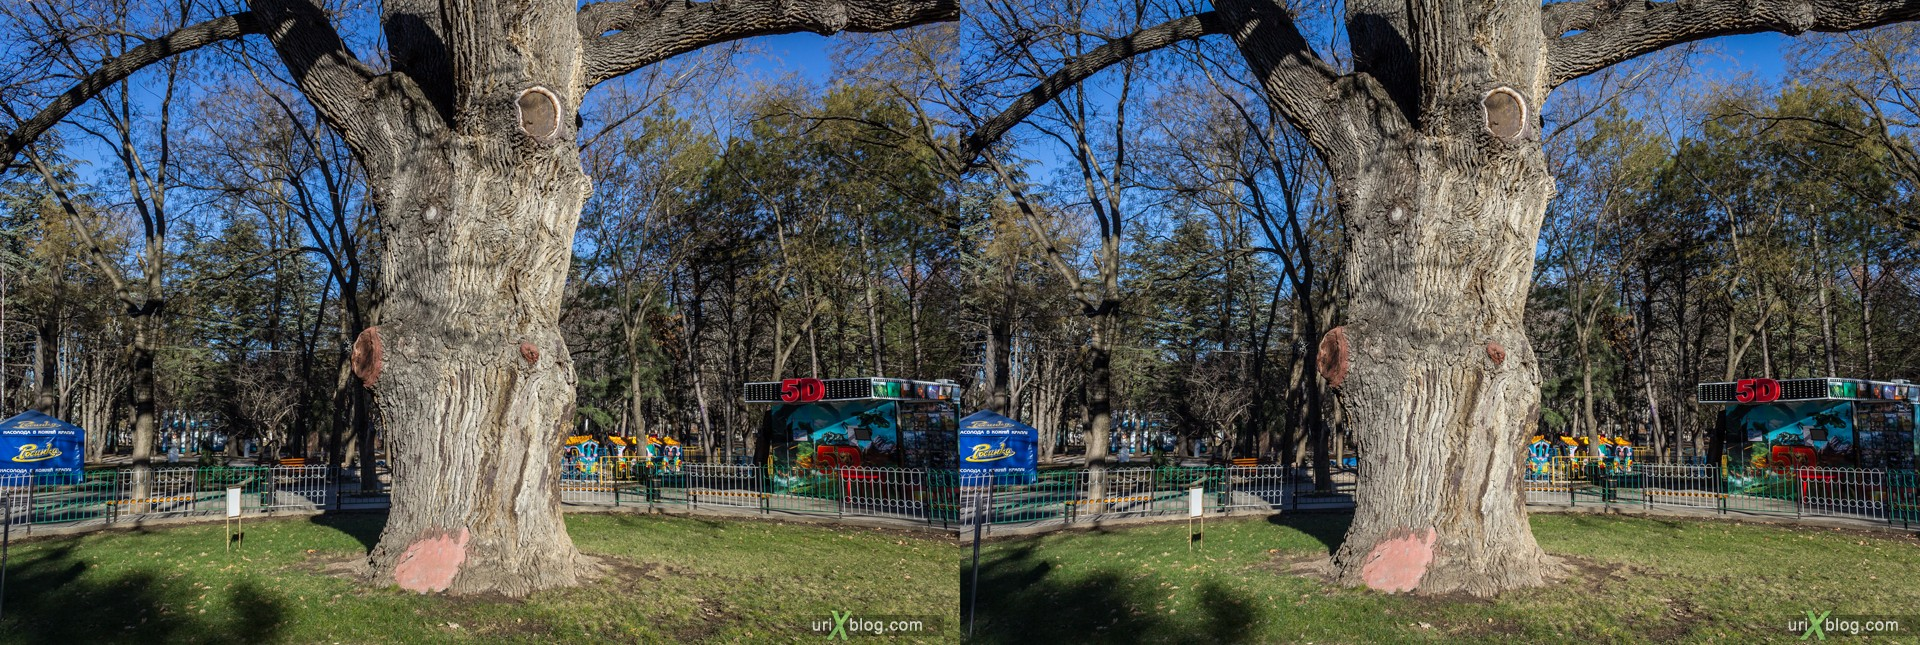 2012, Simferopol, Childrens park, Crimea, Russia, Ukraine, winter, 3D, stereo pair, cross-eyed, crossview, cross view stereo pair, stereoscopic